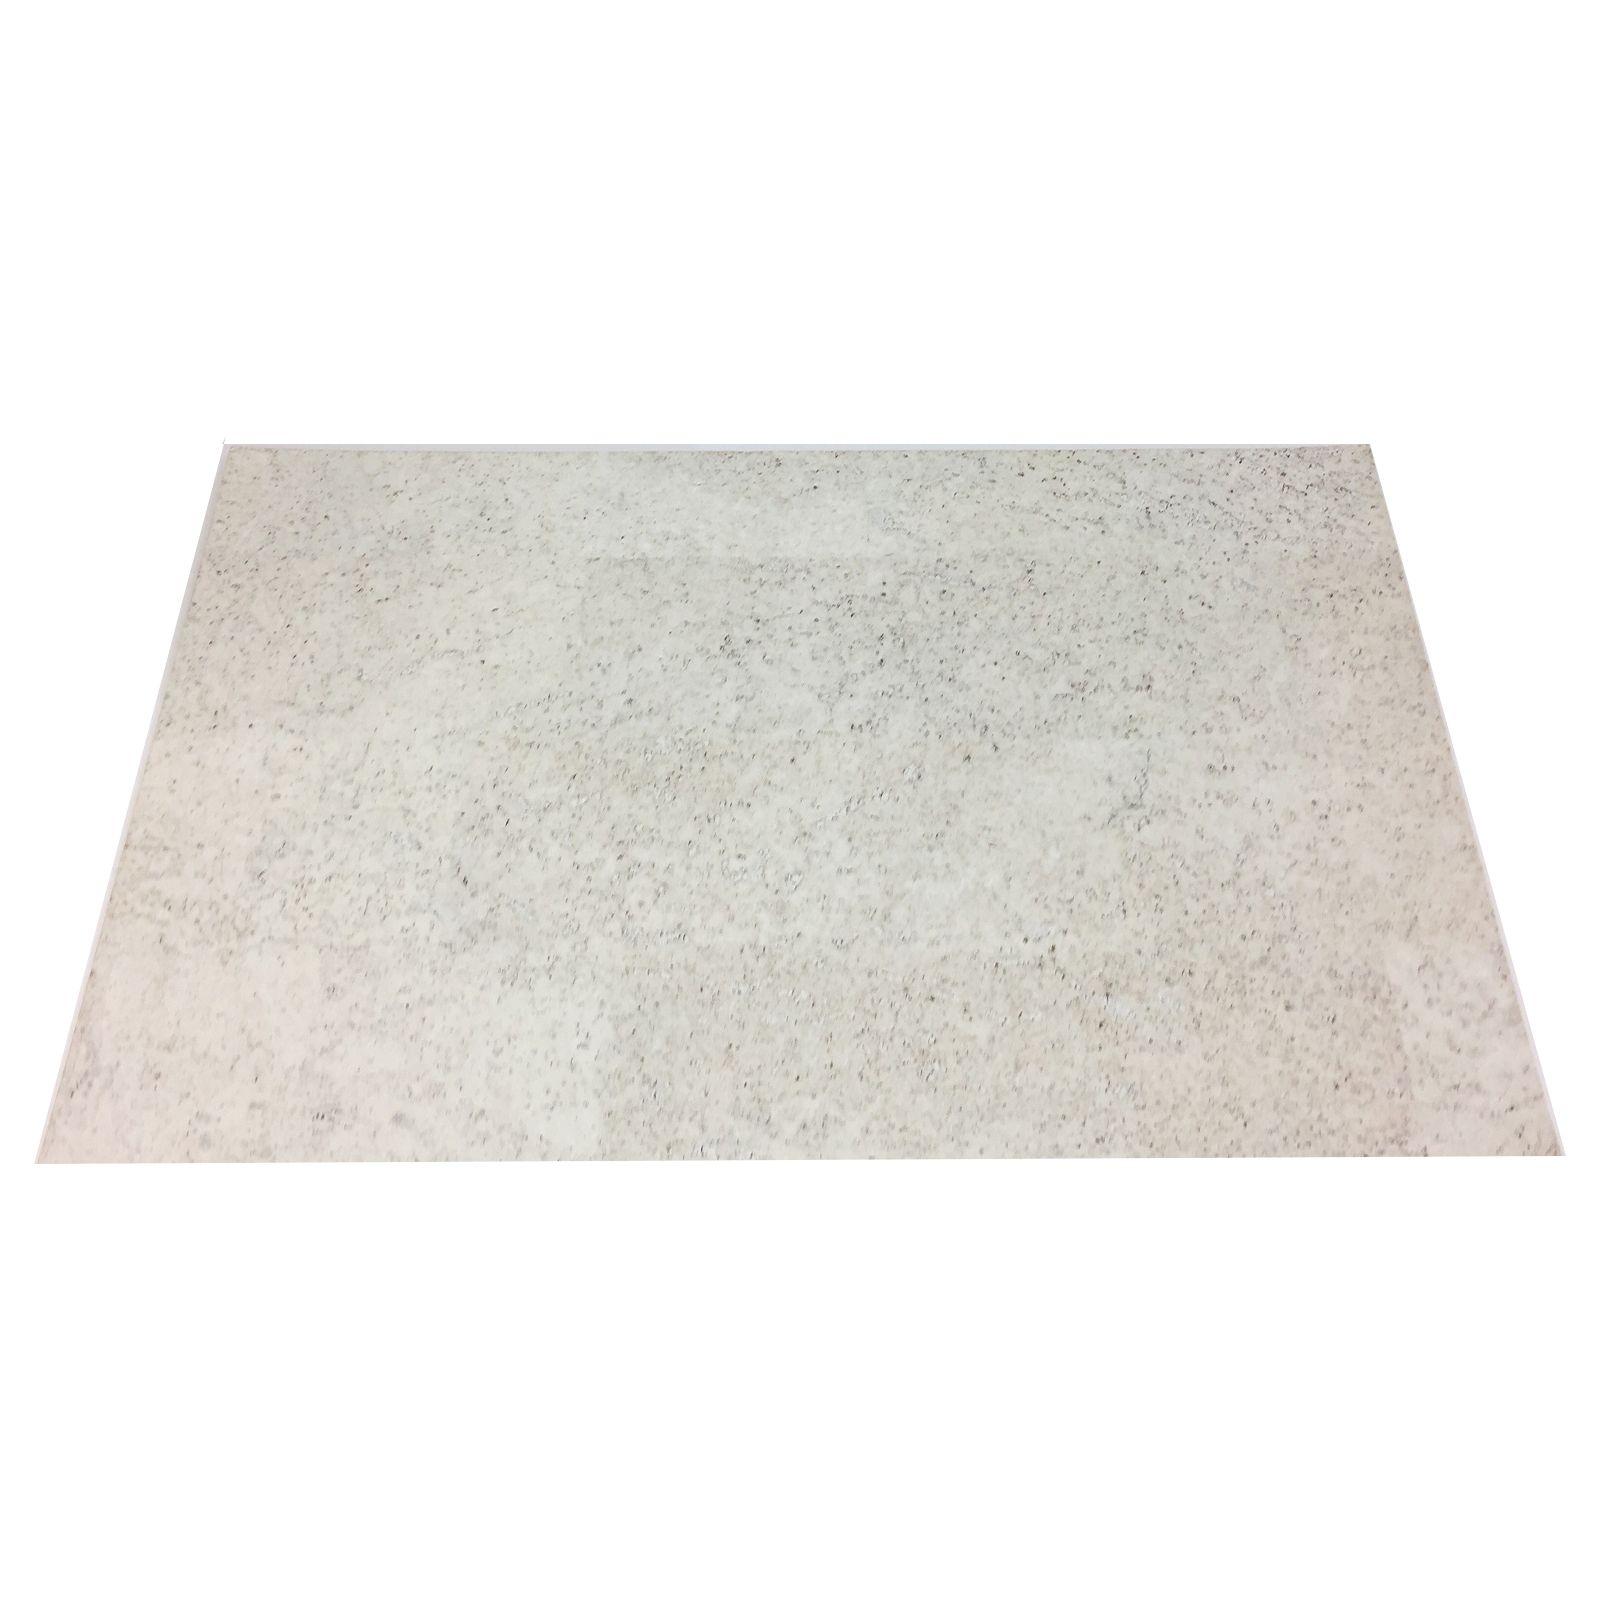 QEP 60 x 30cm Champagne Q-Decor Cork Wall Tiles   Bunnings Warehouse